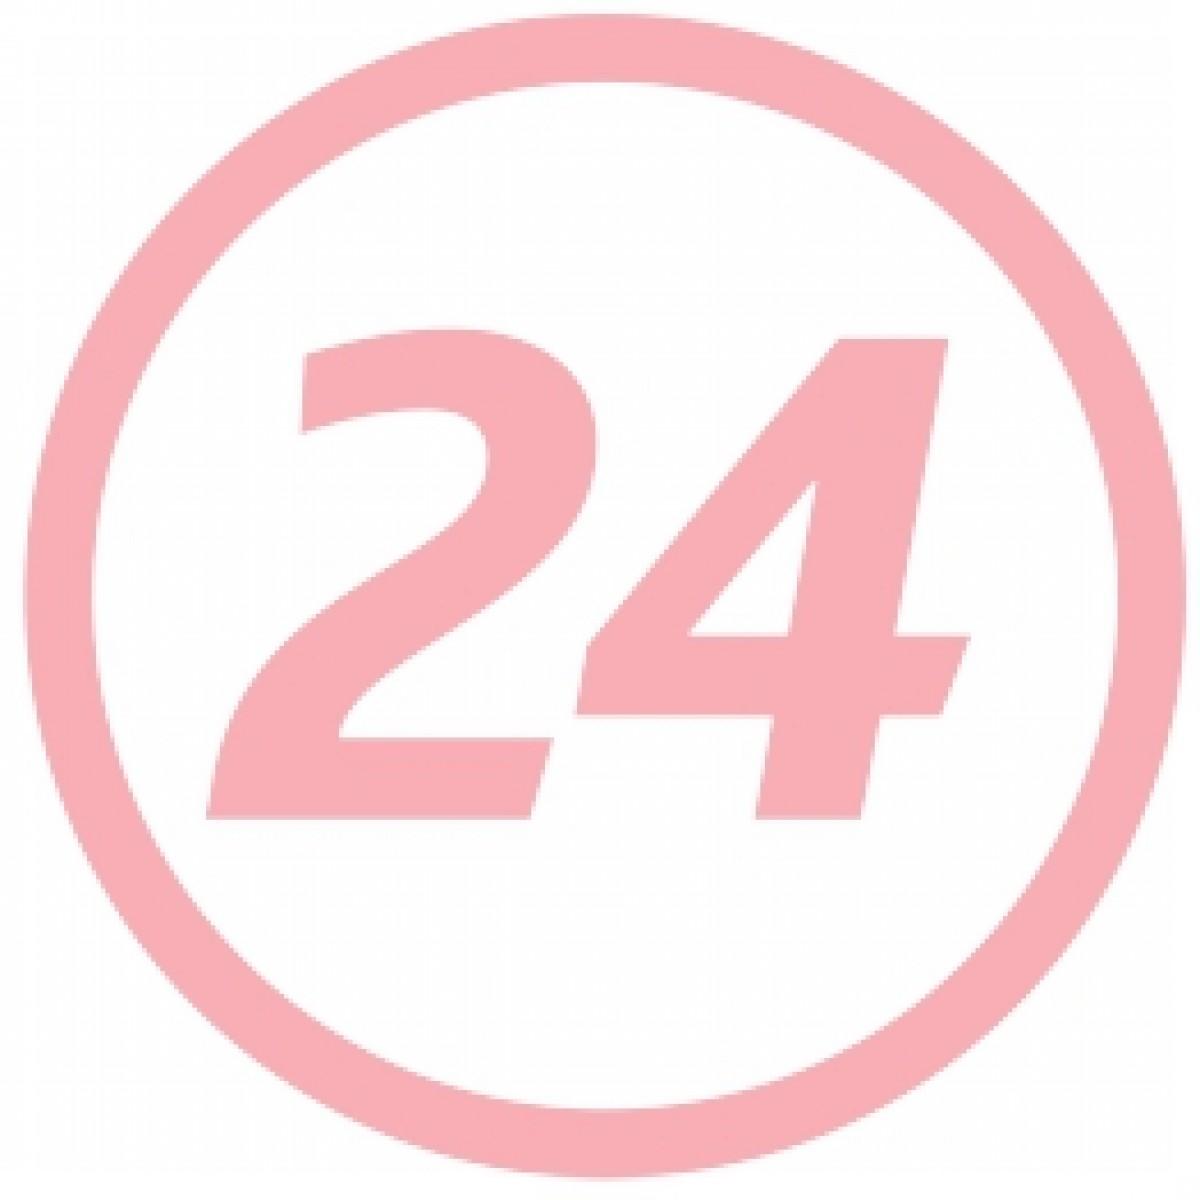 Nuk,  Aparat Emisie Receptie 266, Monitorizare Bebe, 1buc